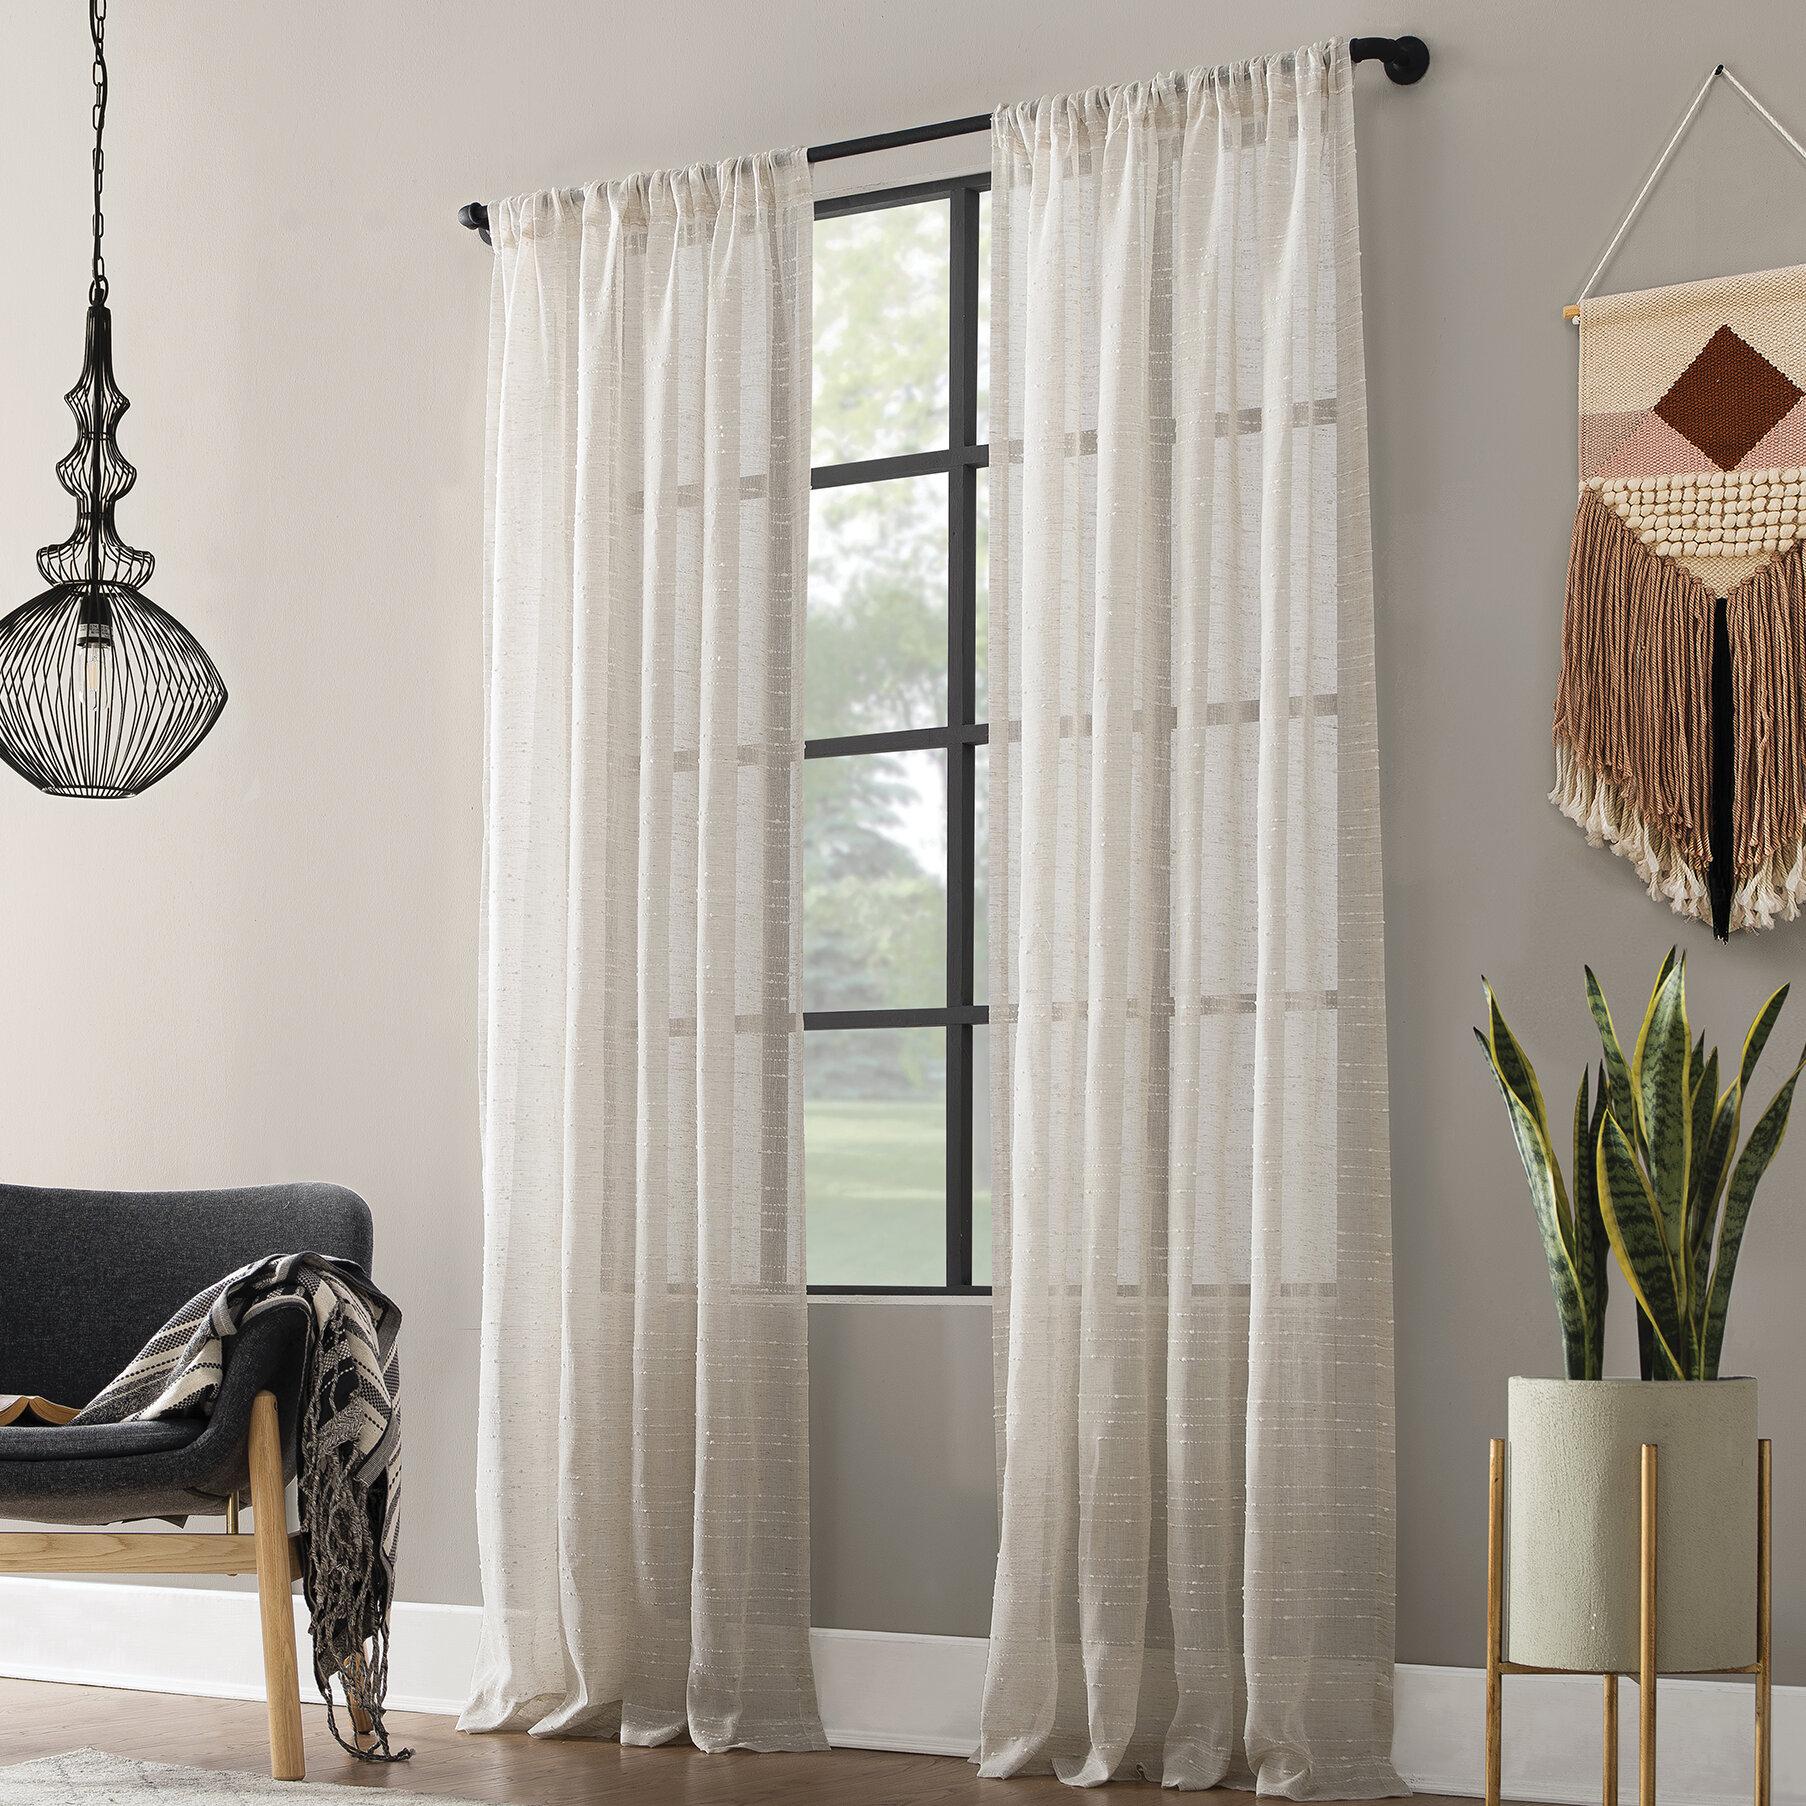 Textured Slub Anti Dust Striped Semi Sheer Rod Pocket Single Curtain Panel Reviews Allmodern